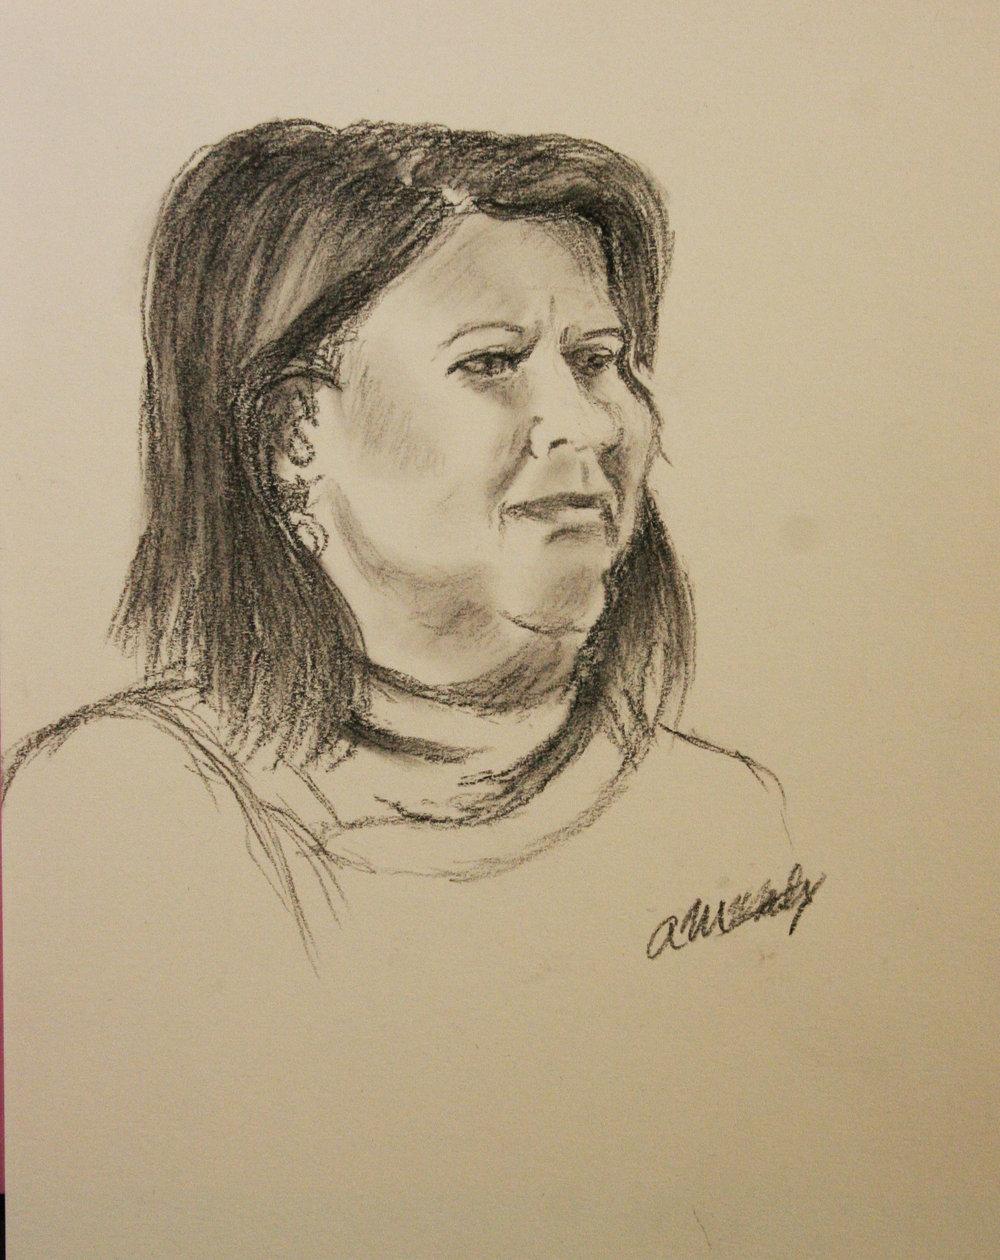 Ana Maria Martinez did this drawing.